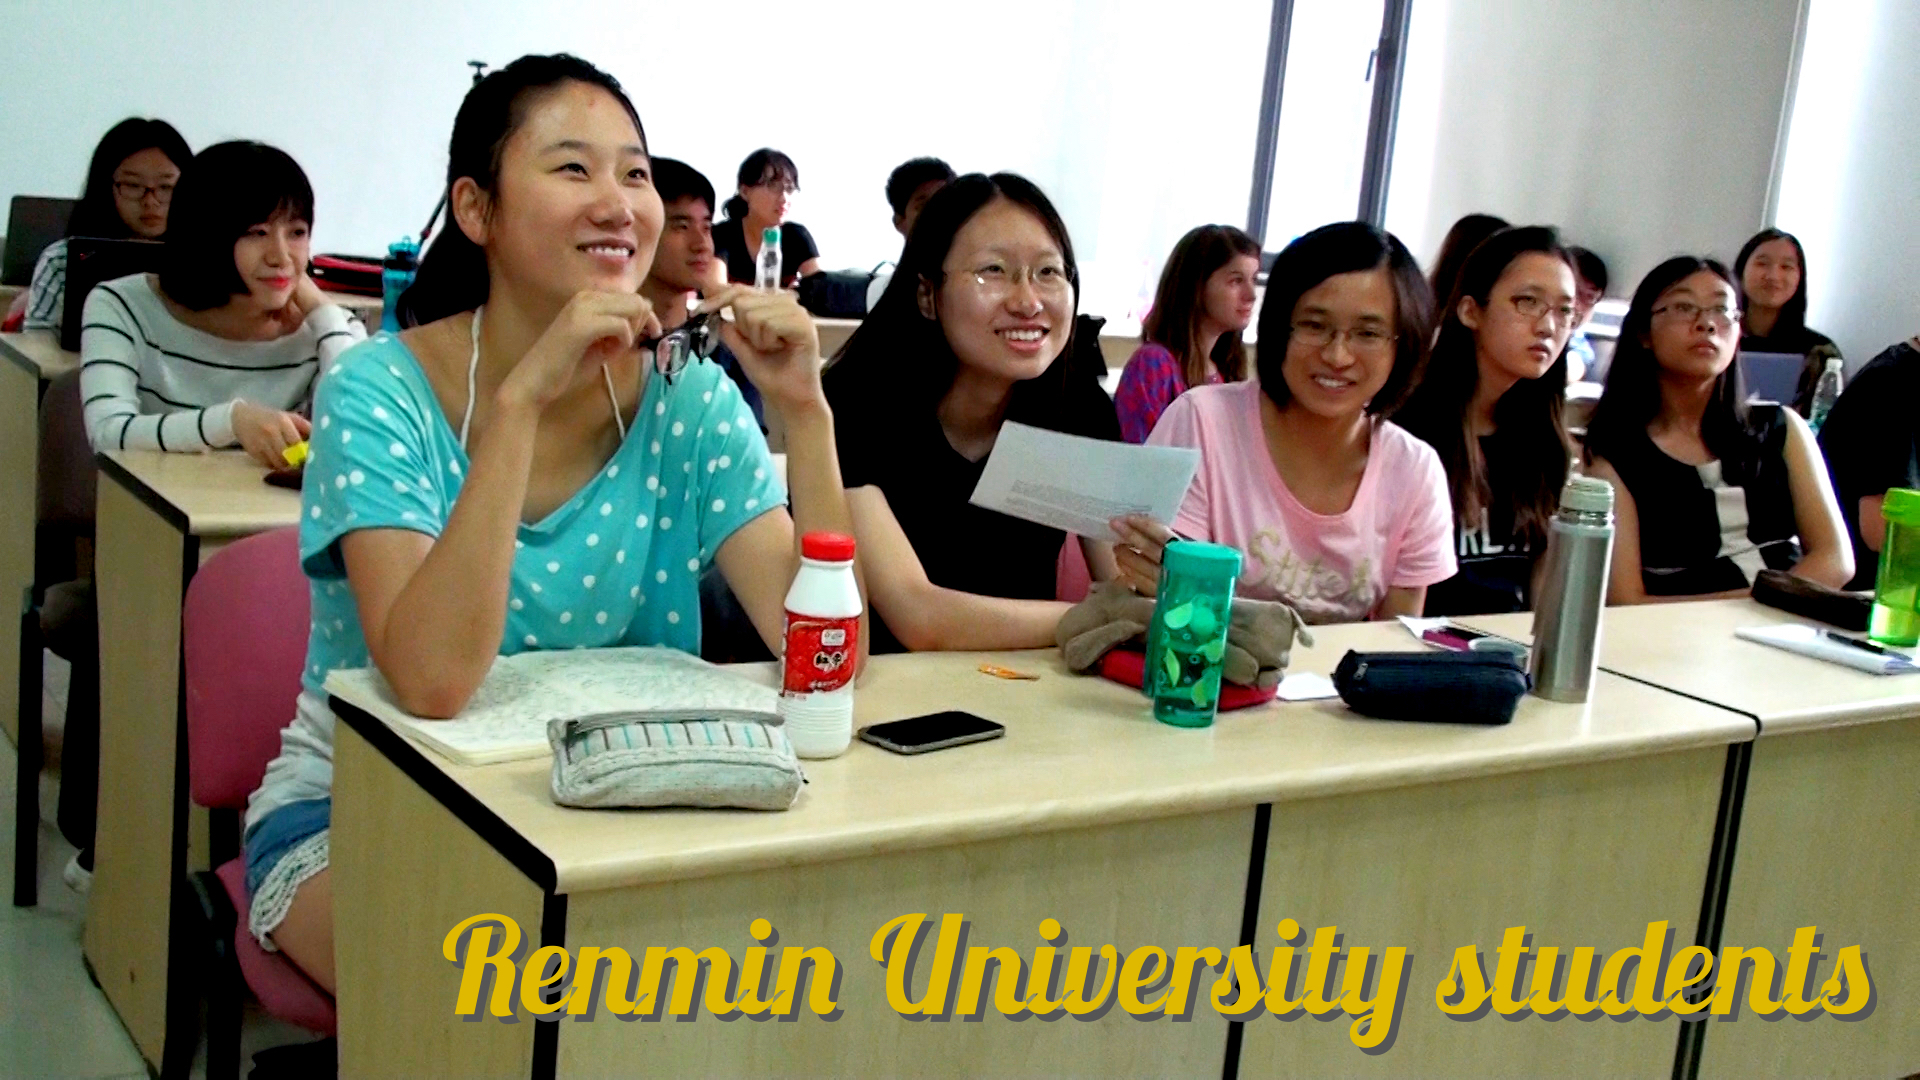 Renmin University students.jpg